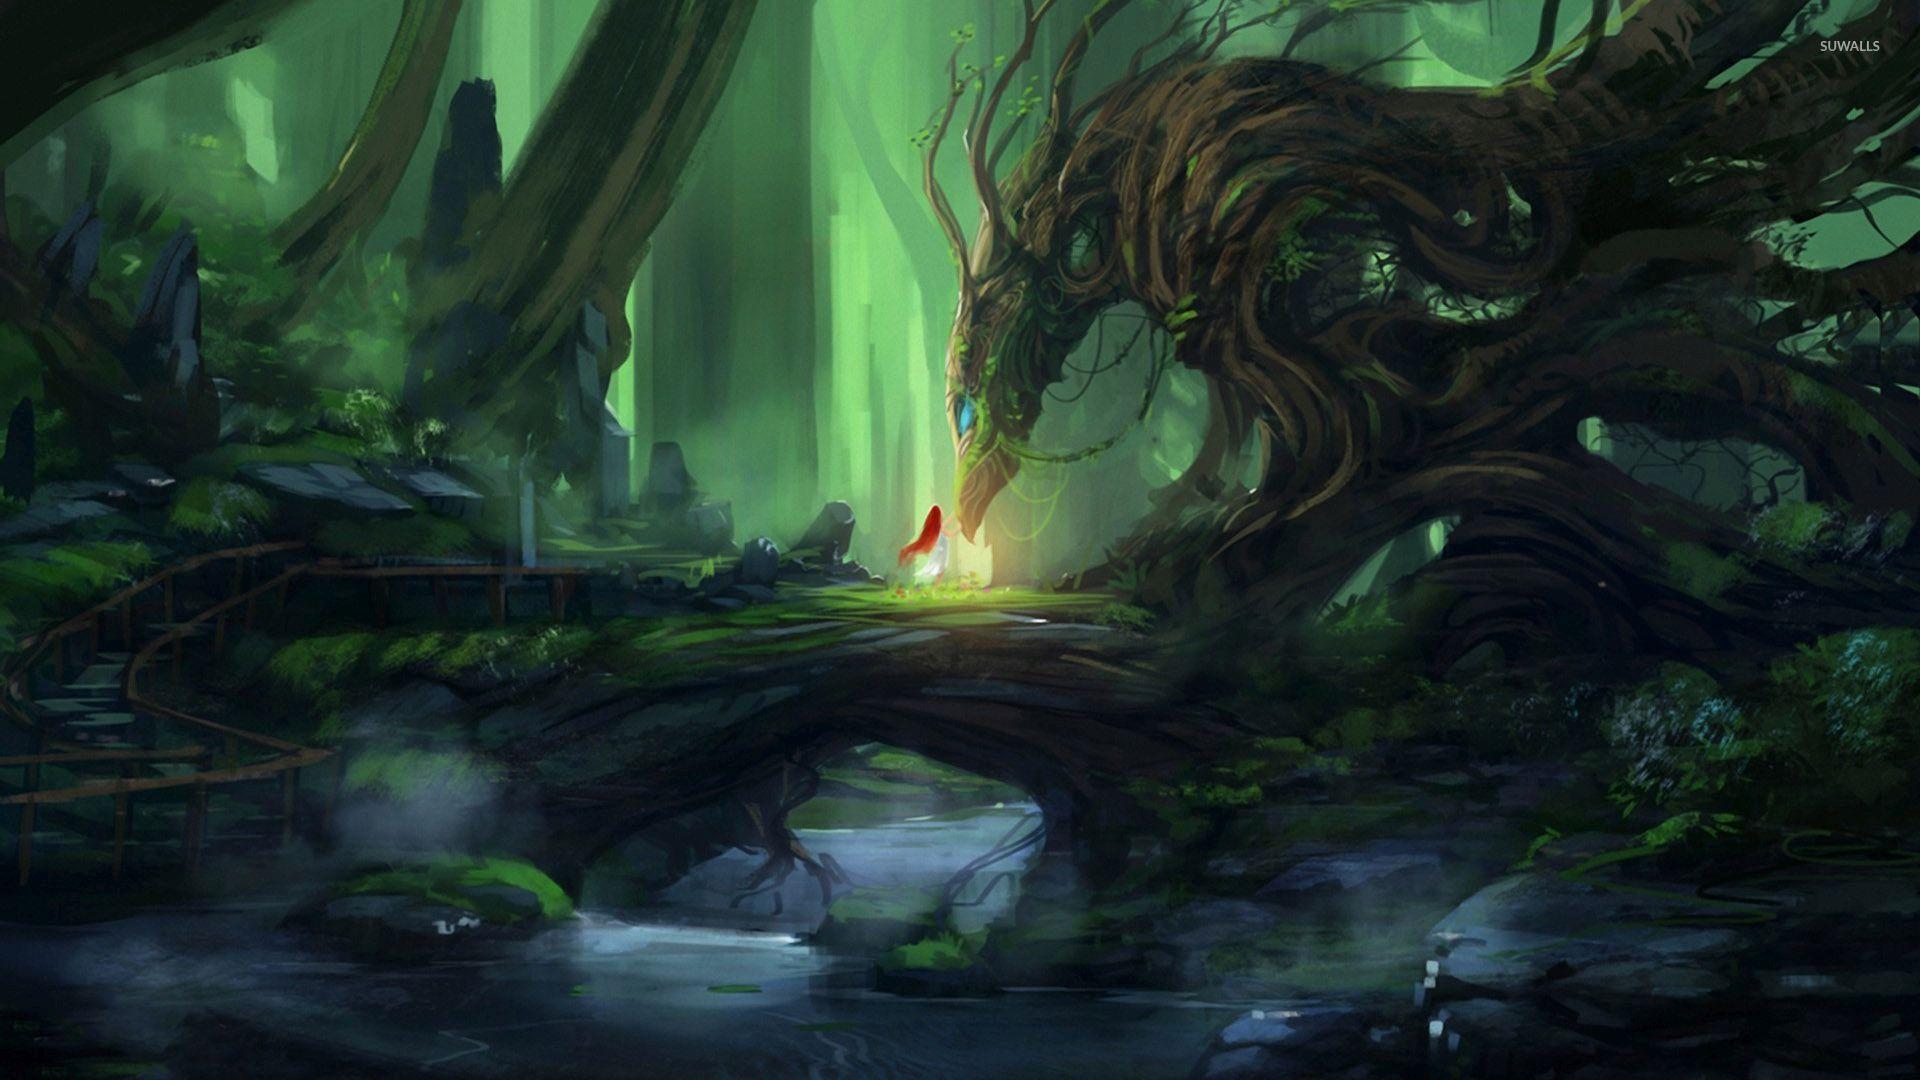 Tree Dragon Wallpaper Fantasy Wallpapers 46915